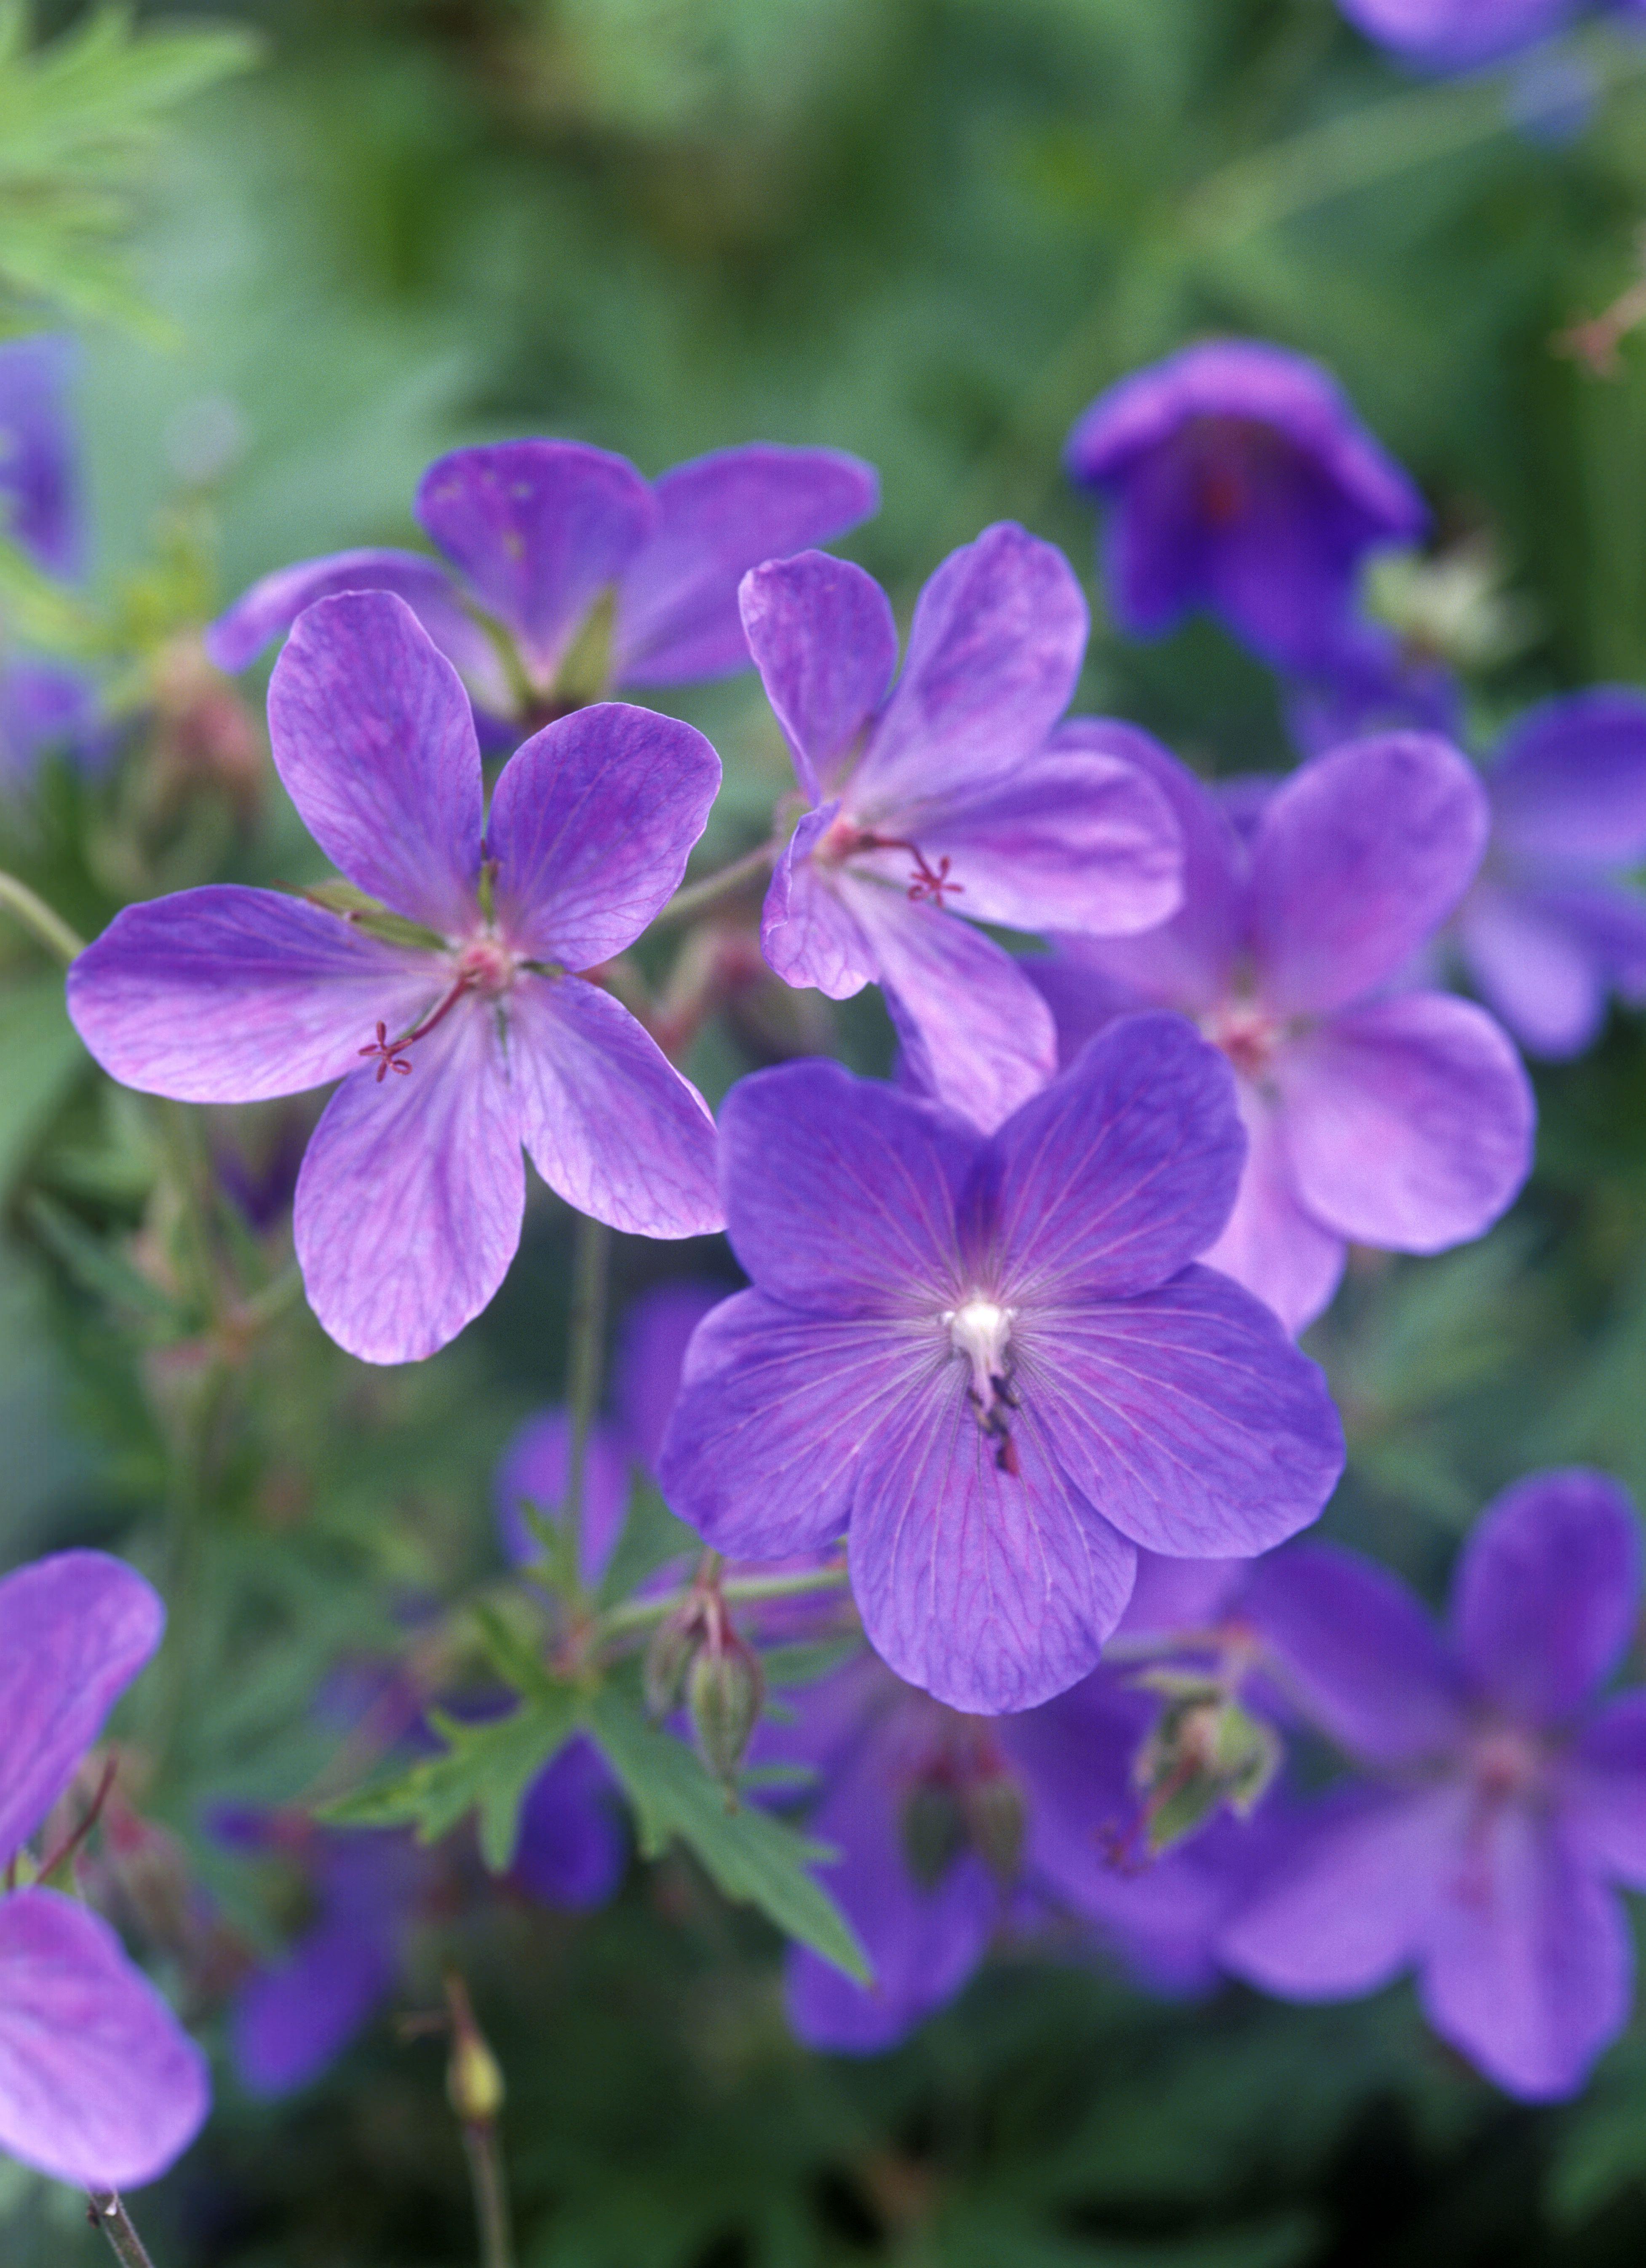 'Johnson's Blue' geraniums with purple flowers